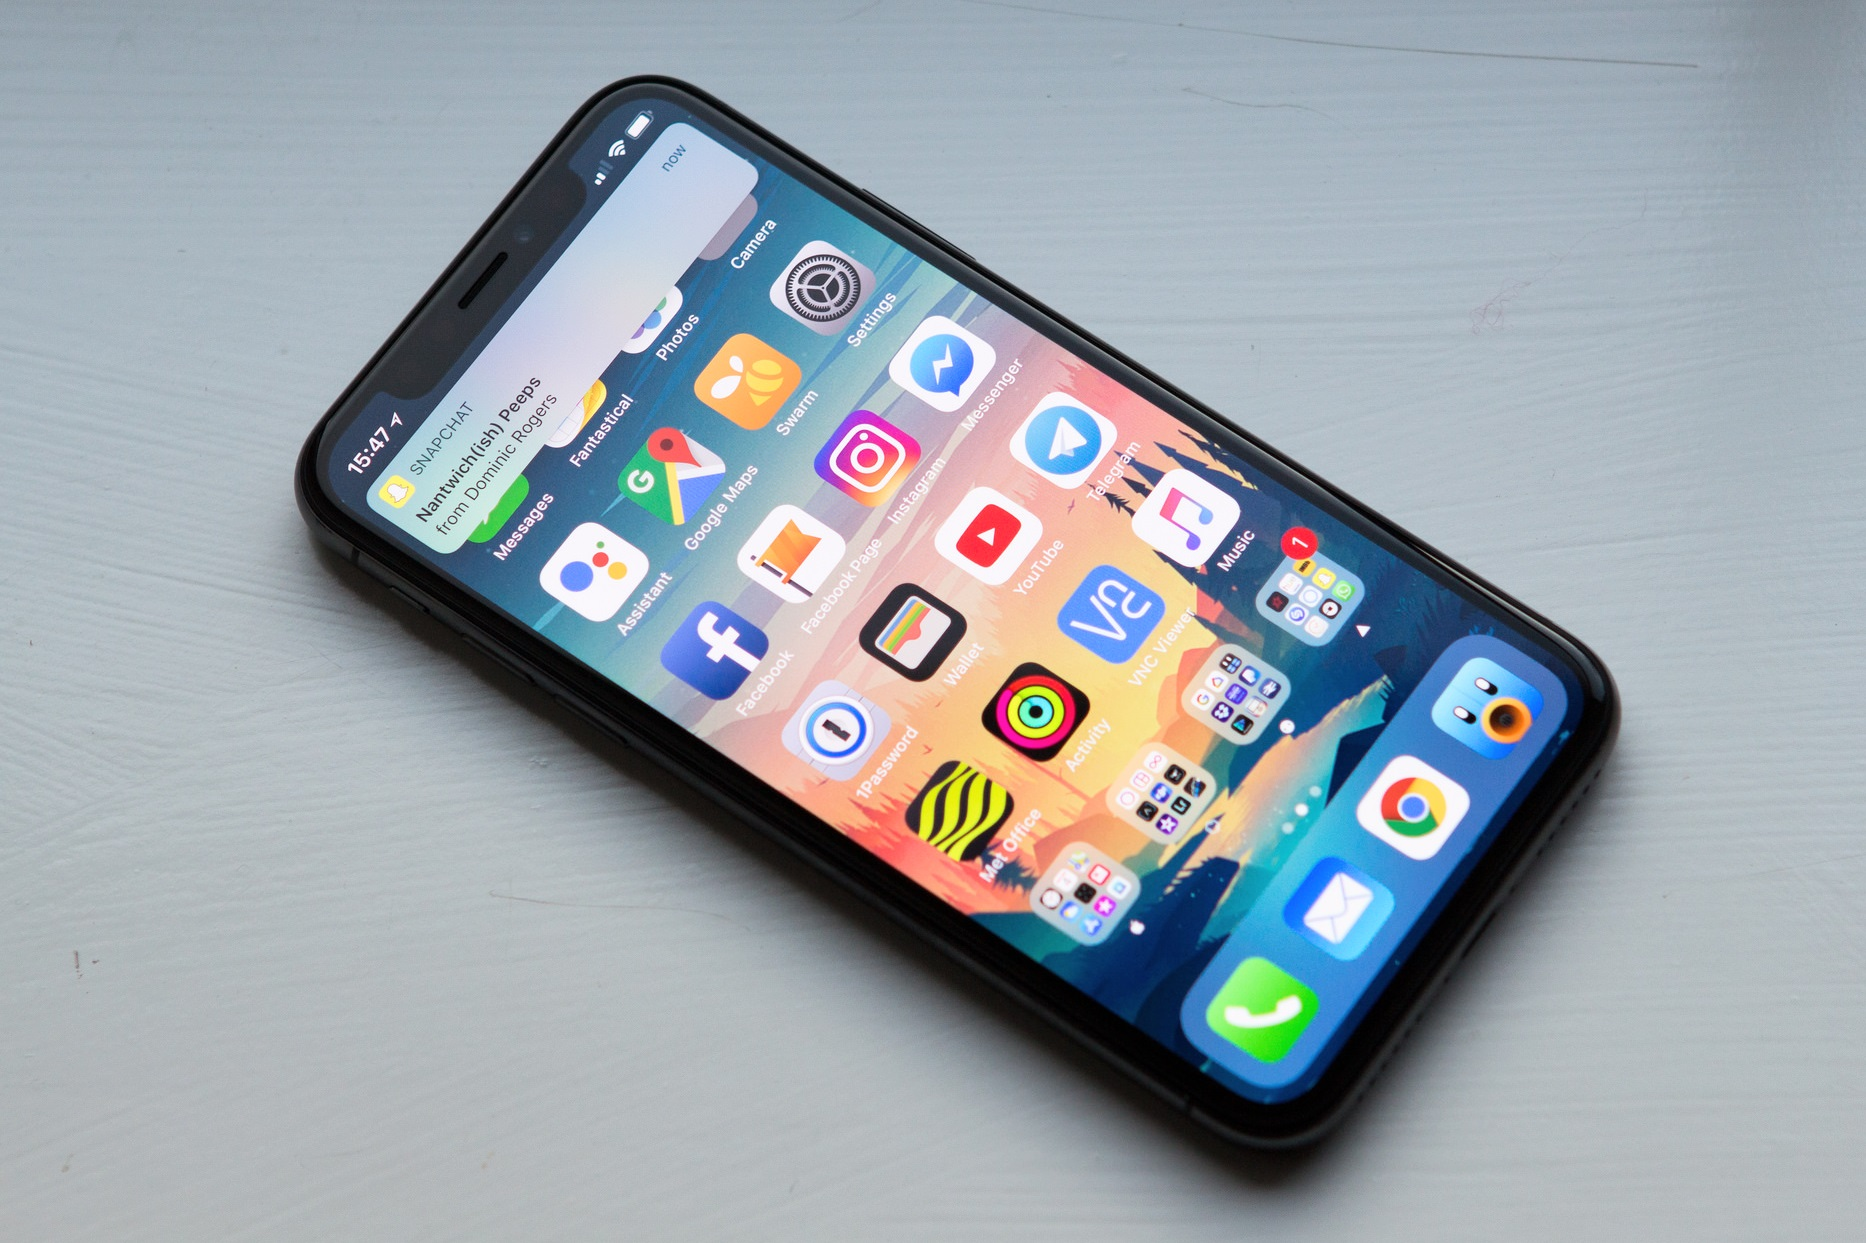 Qué hacer antes de vender, canjear o regalar un iPhone ...